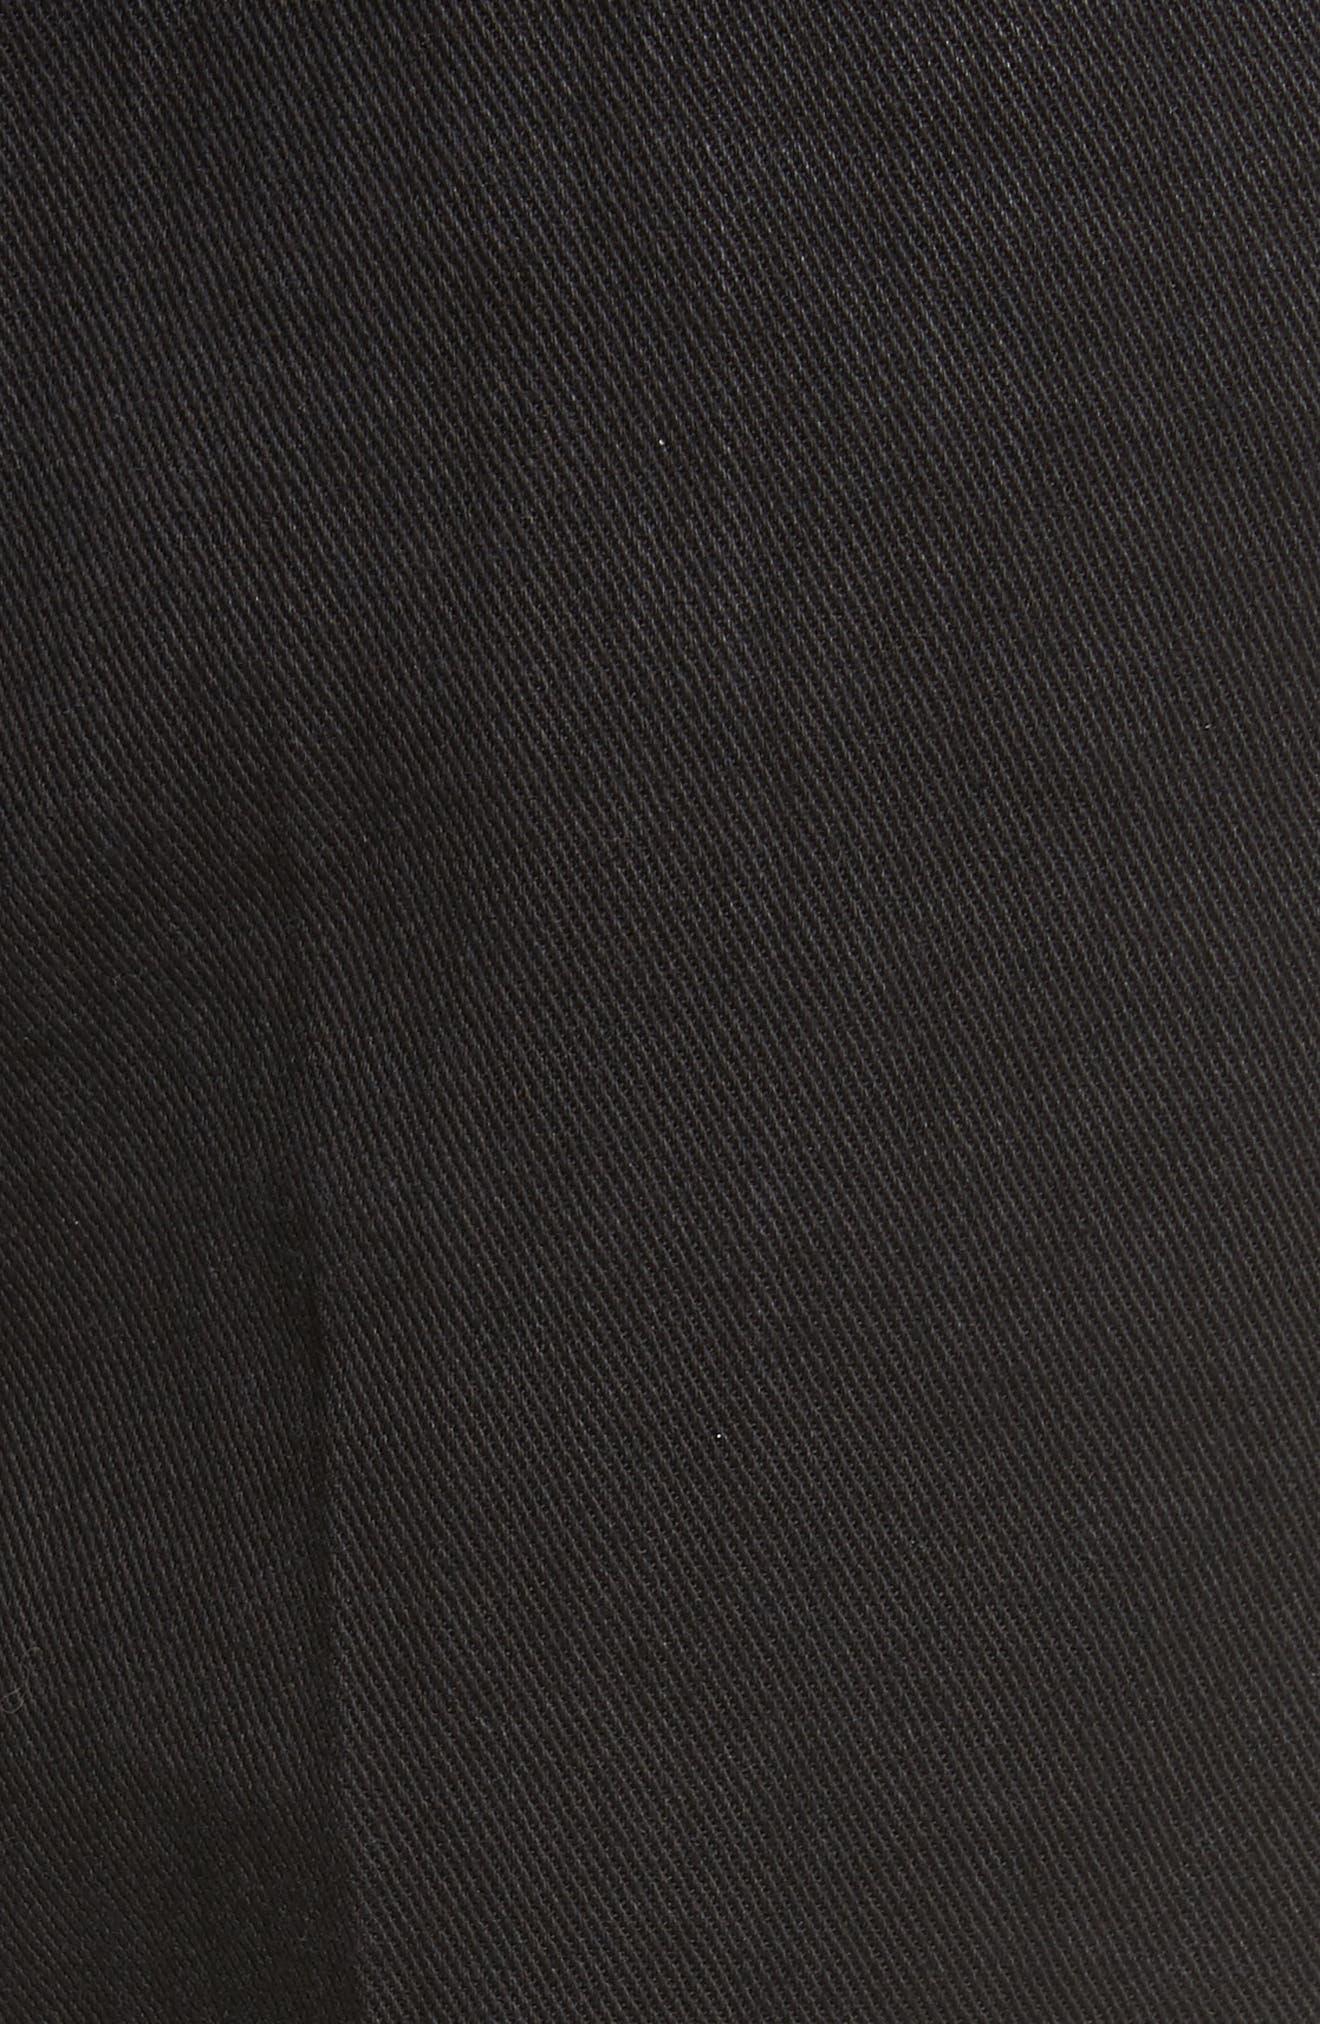 Just Wash Point Hem Wide Leg Jeans,                             Alternate thumbnail 5, color,                             001